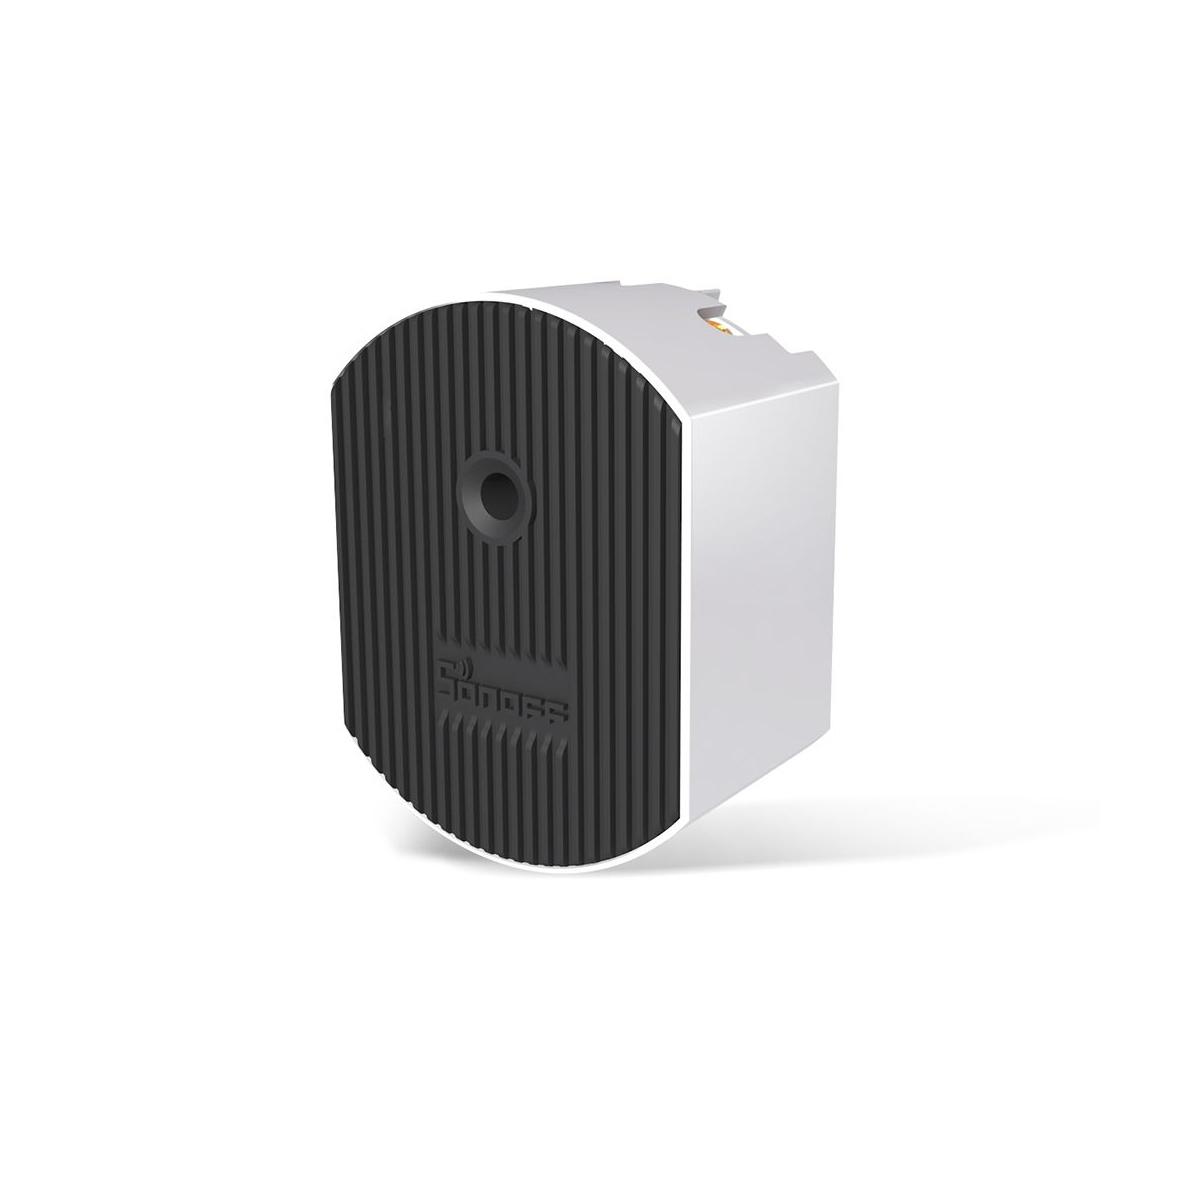 Sonoff D1 Smart Switch, Ενδιάμεσος Διακόπτης RF με Dimmer - M0802010005